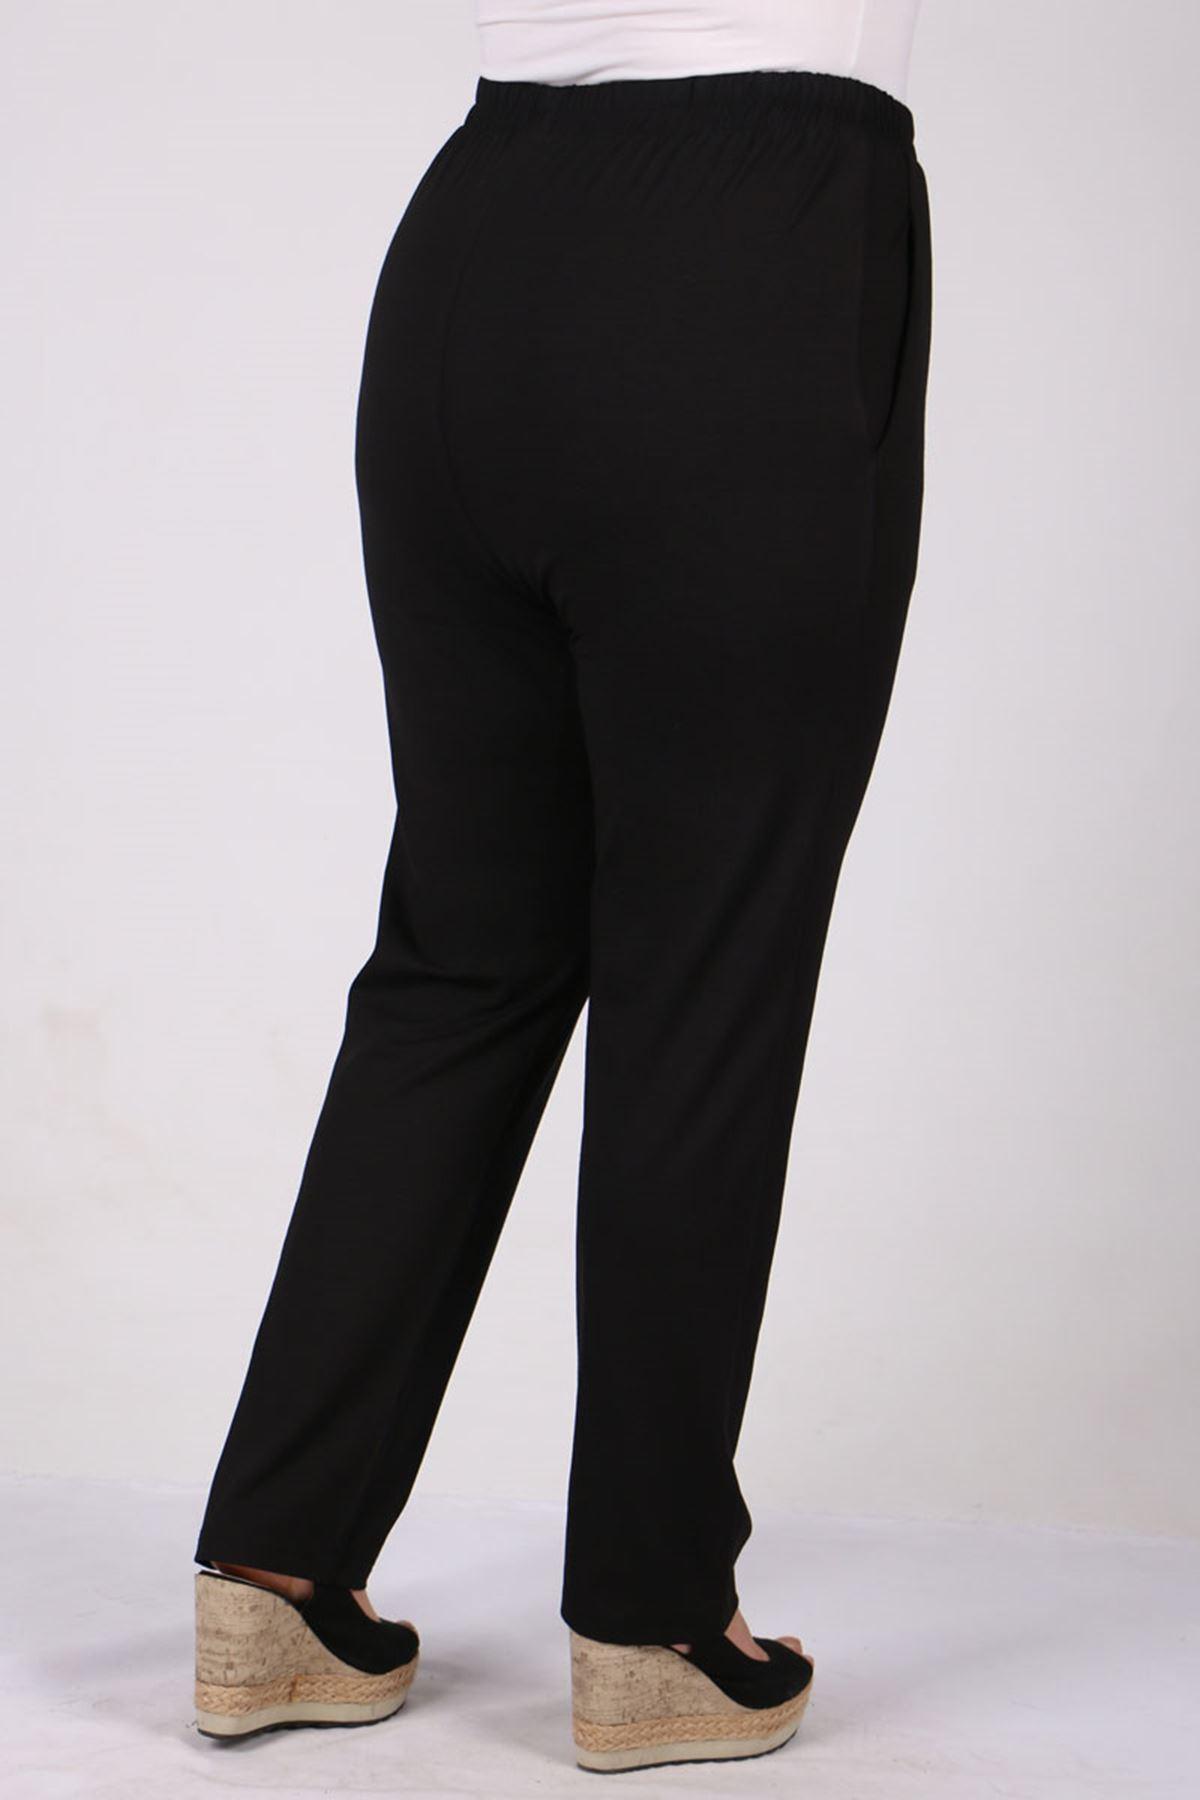 9160 Plus Size High Waist Elastic Pants - Black